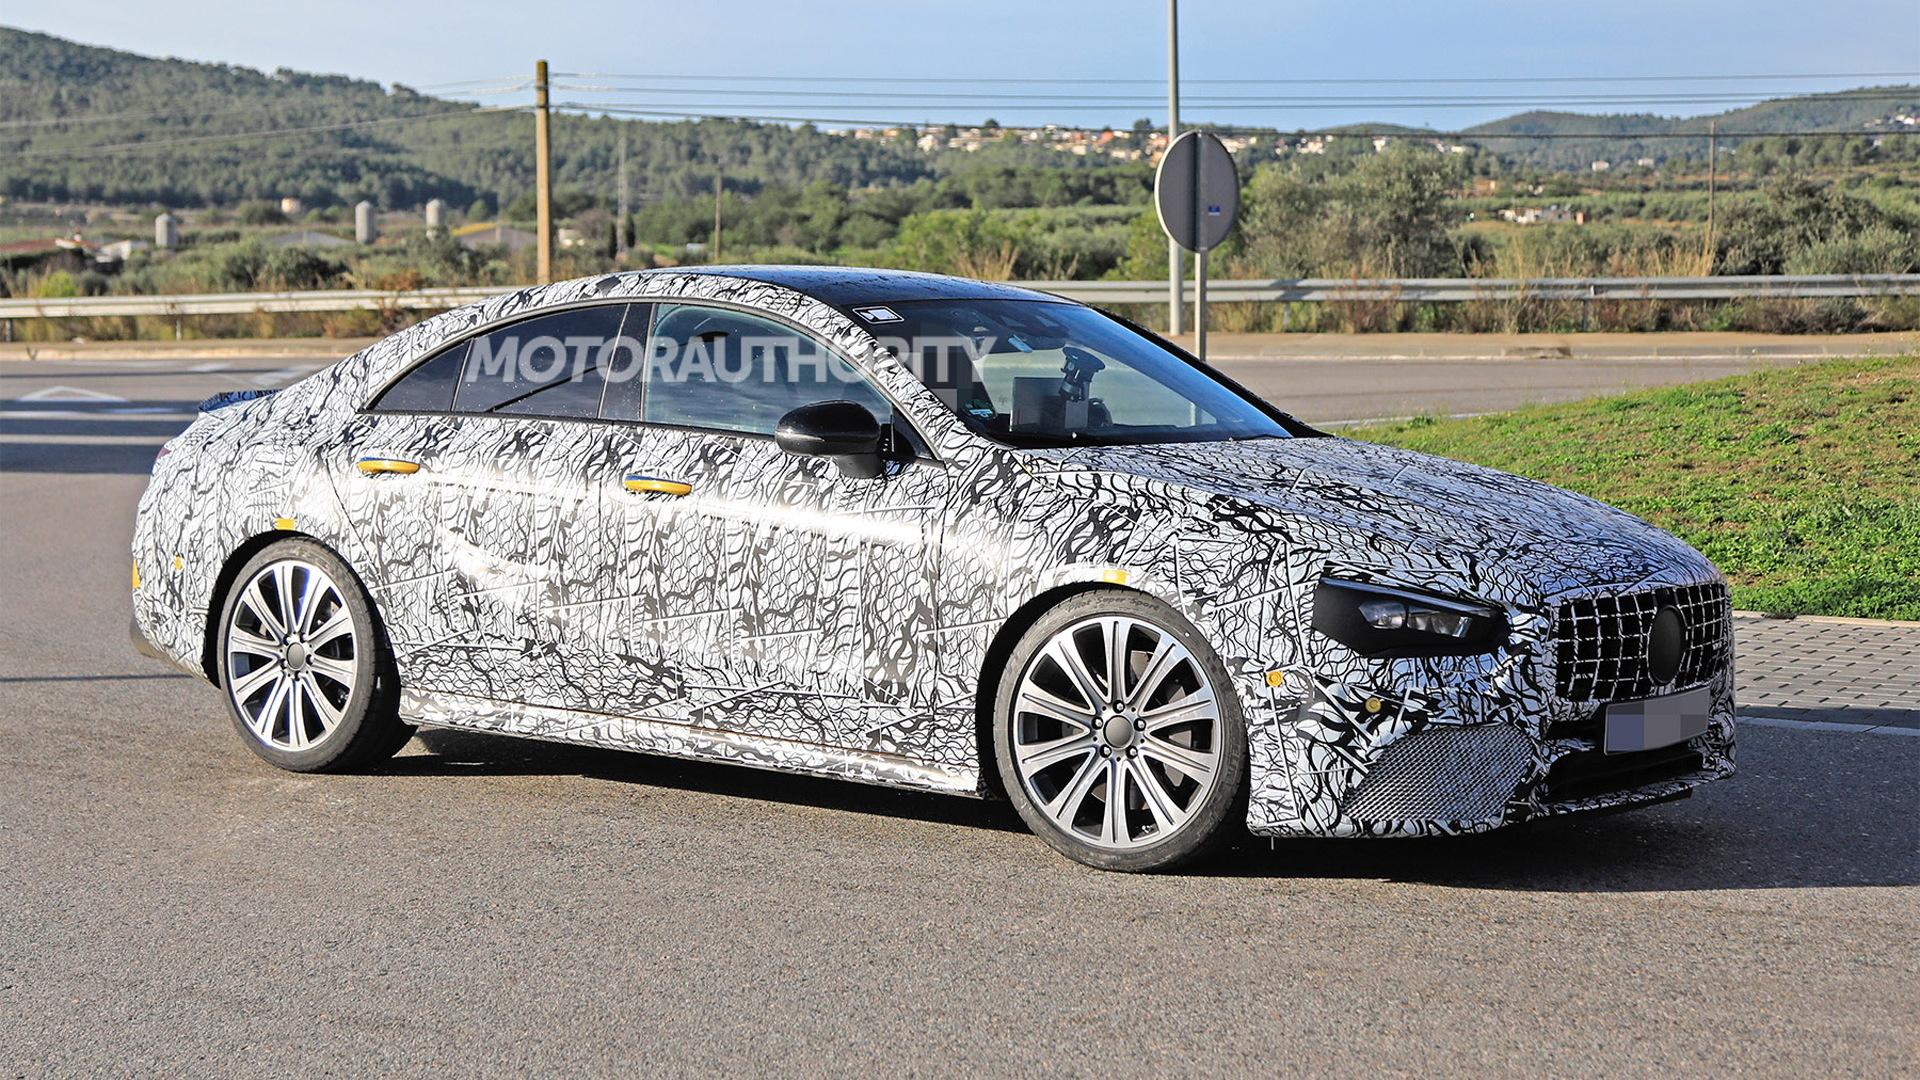 2020 Mercedes-AMG CLA45 spy shots - Image via S. Baldauf/SB-Medien